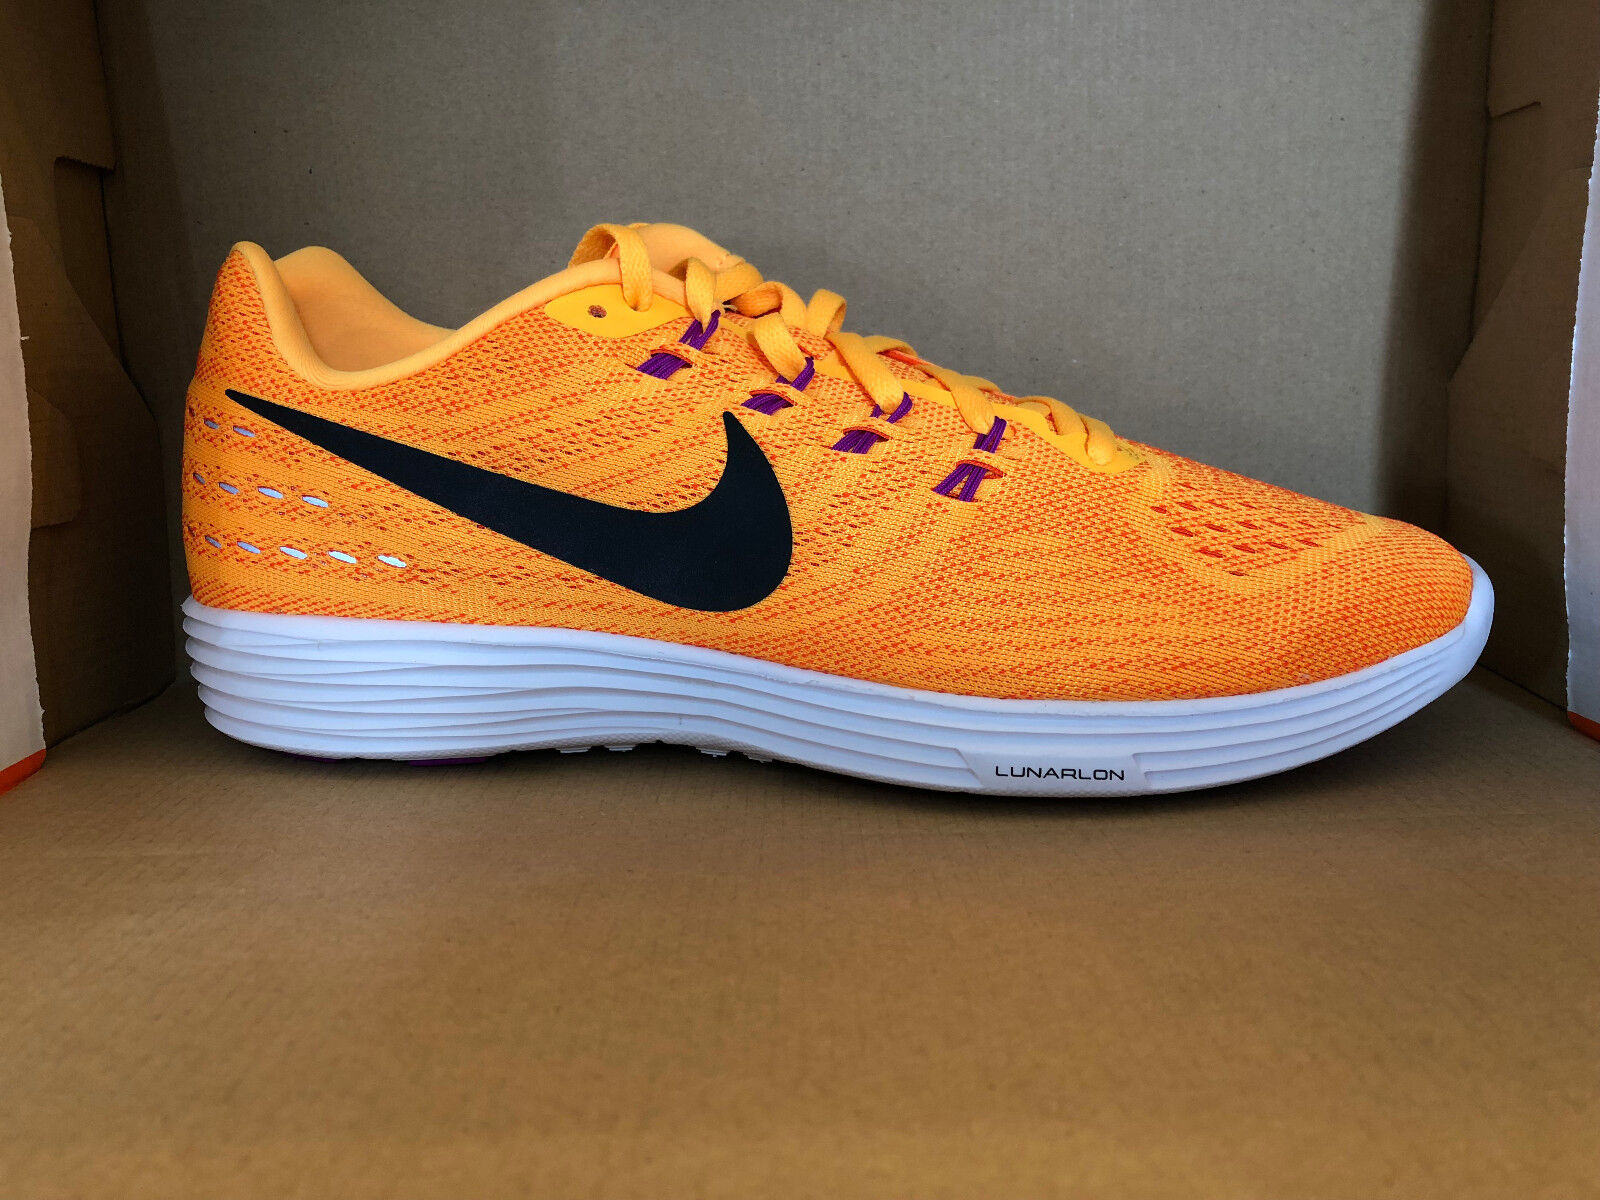 NIKE femmes LUNARTEMPO 2 Chaussures 12 orange orange orange noir Blanc 818098 801 e35d61